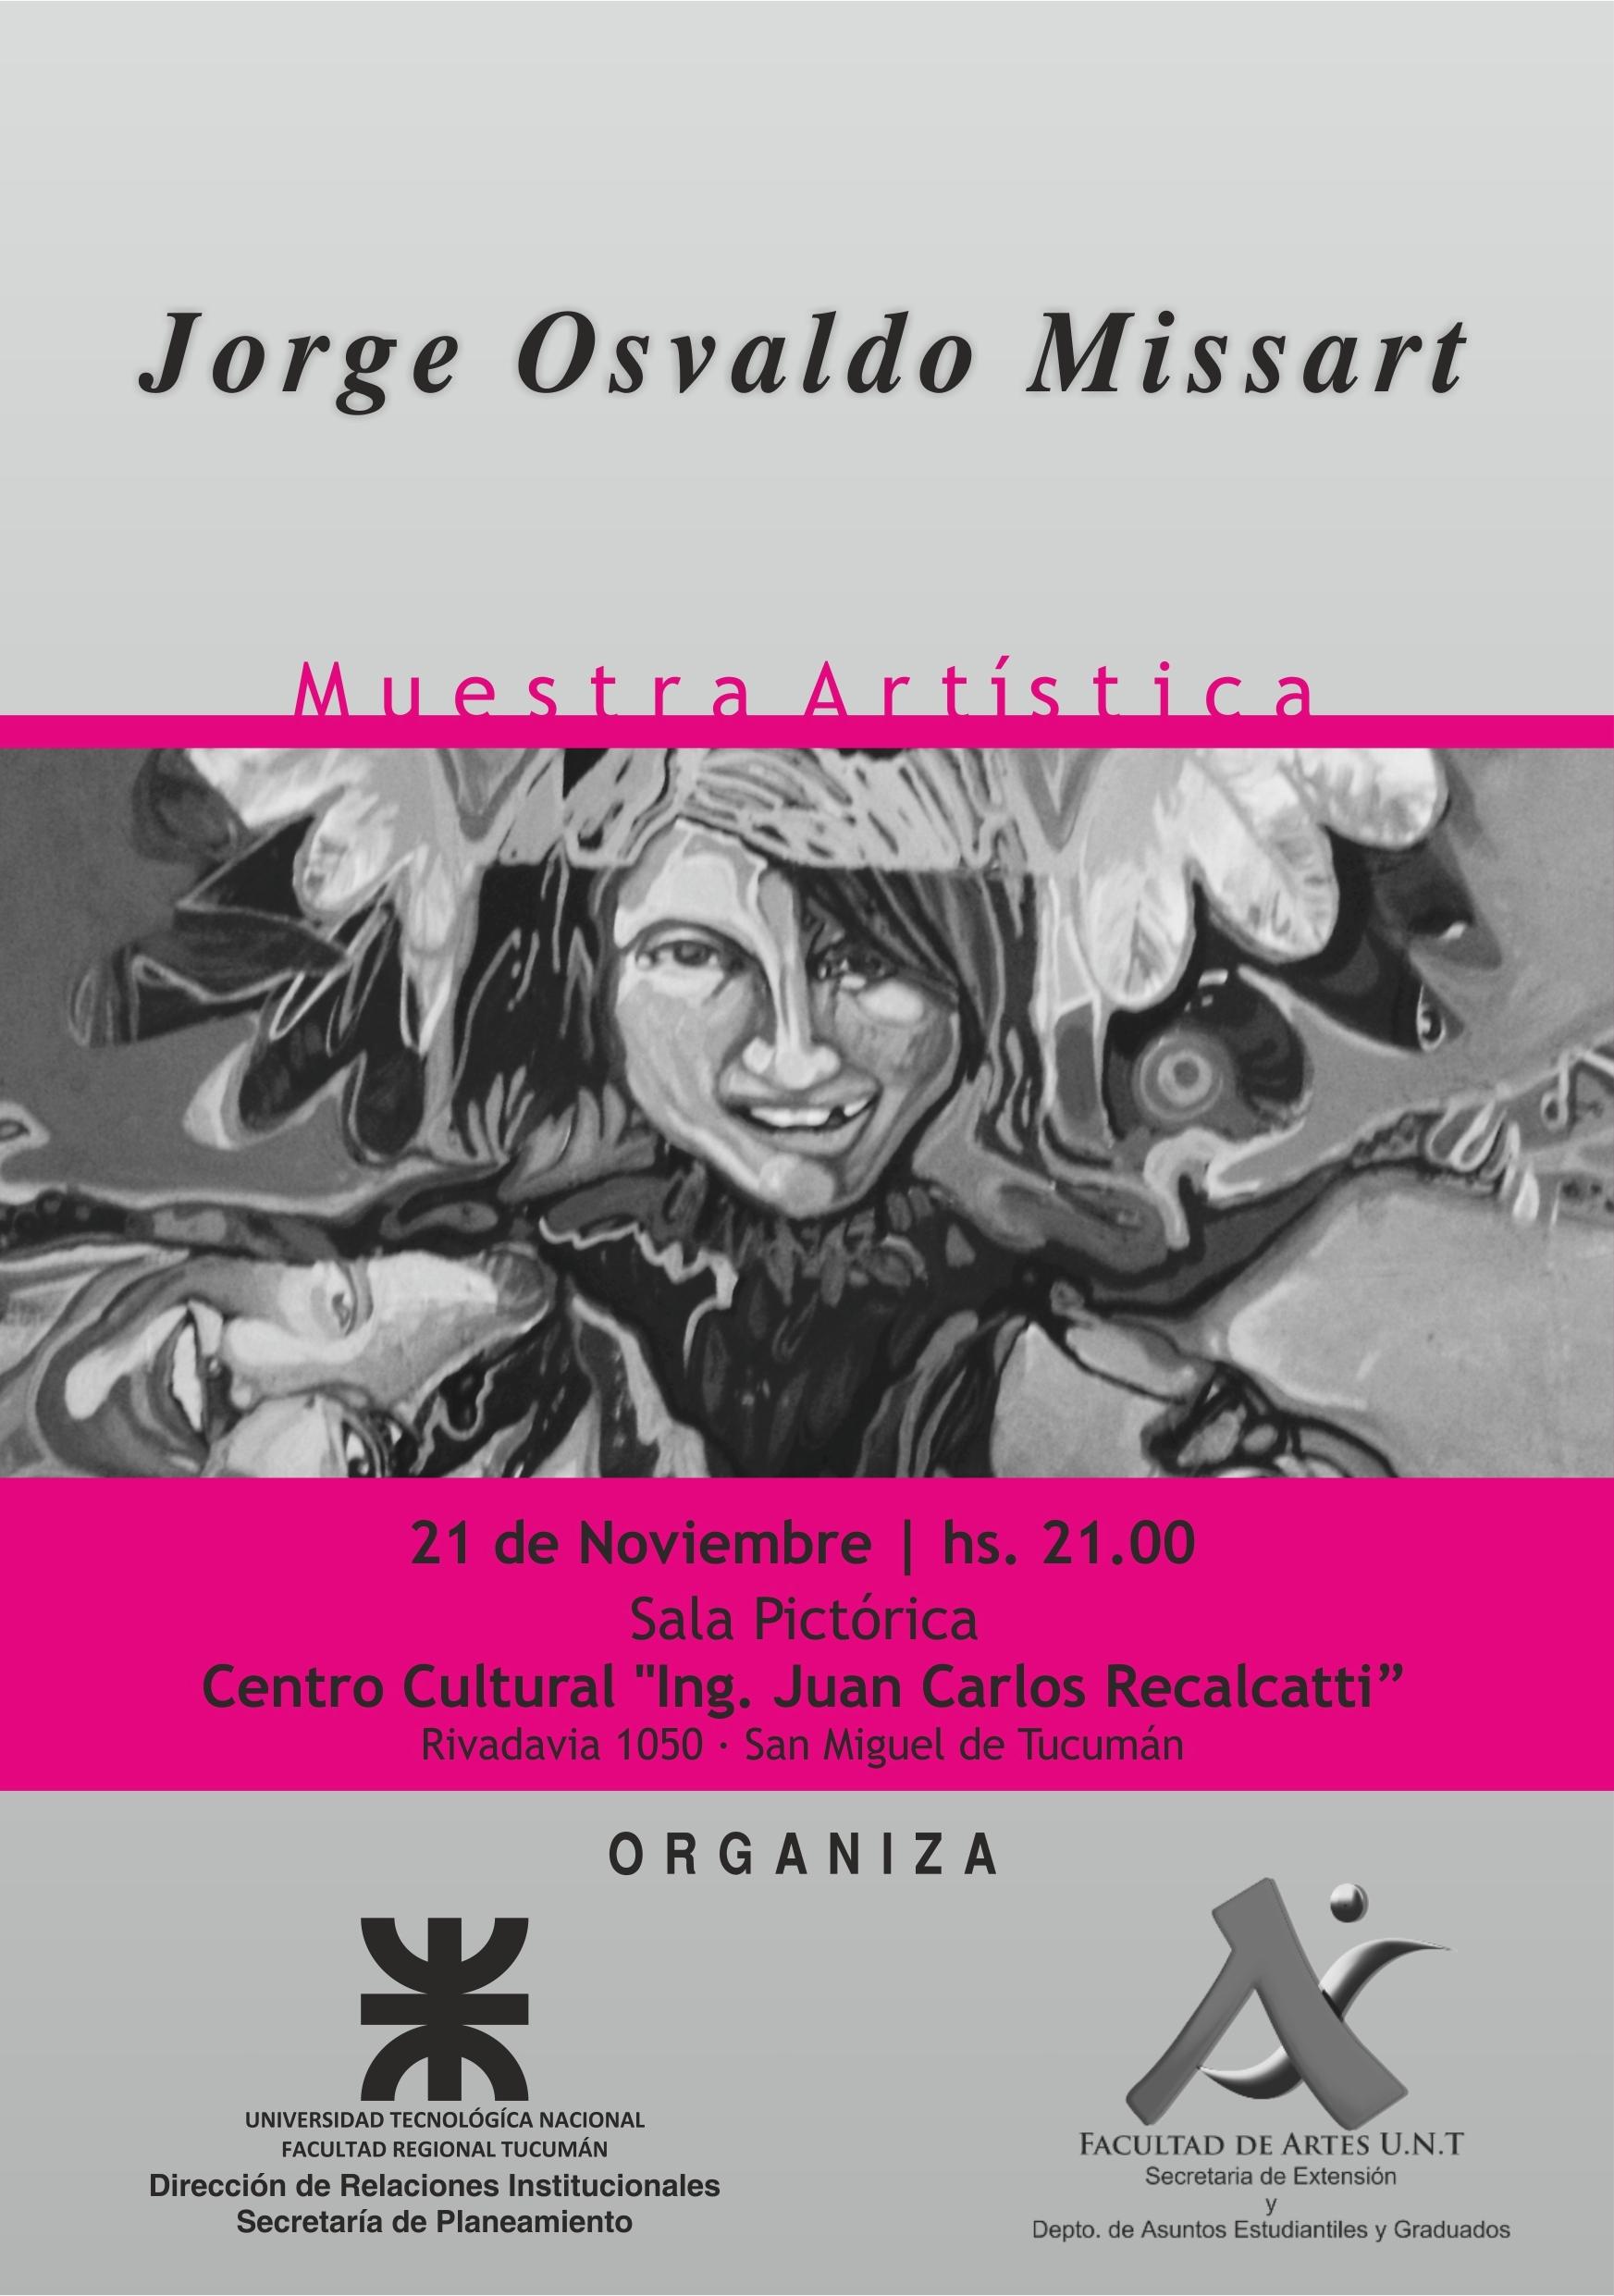 Muestra_de_Arte_Jorge_Osvaldo_Missart.jpg